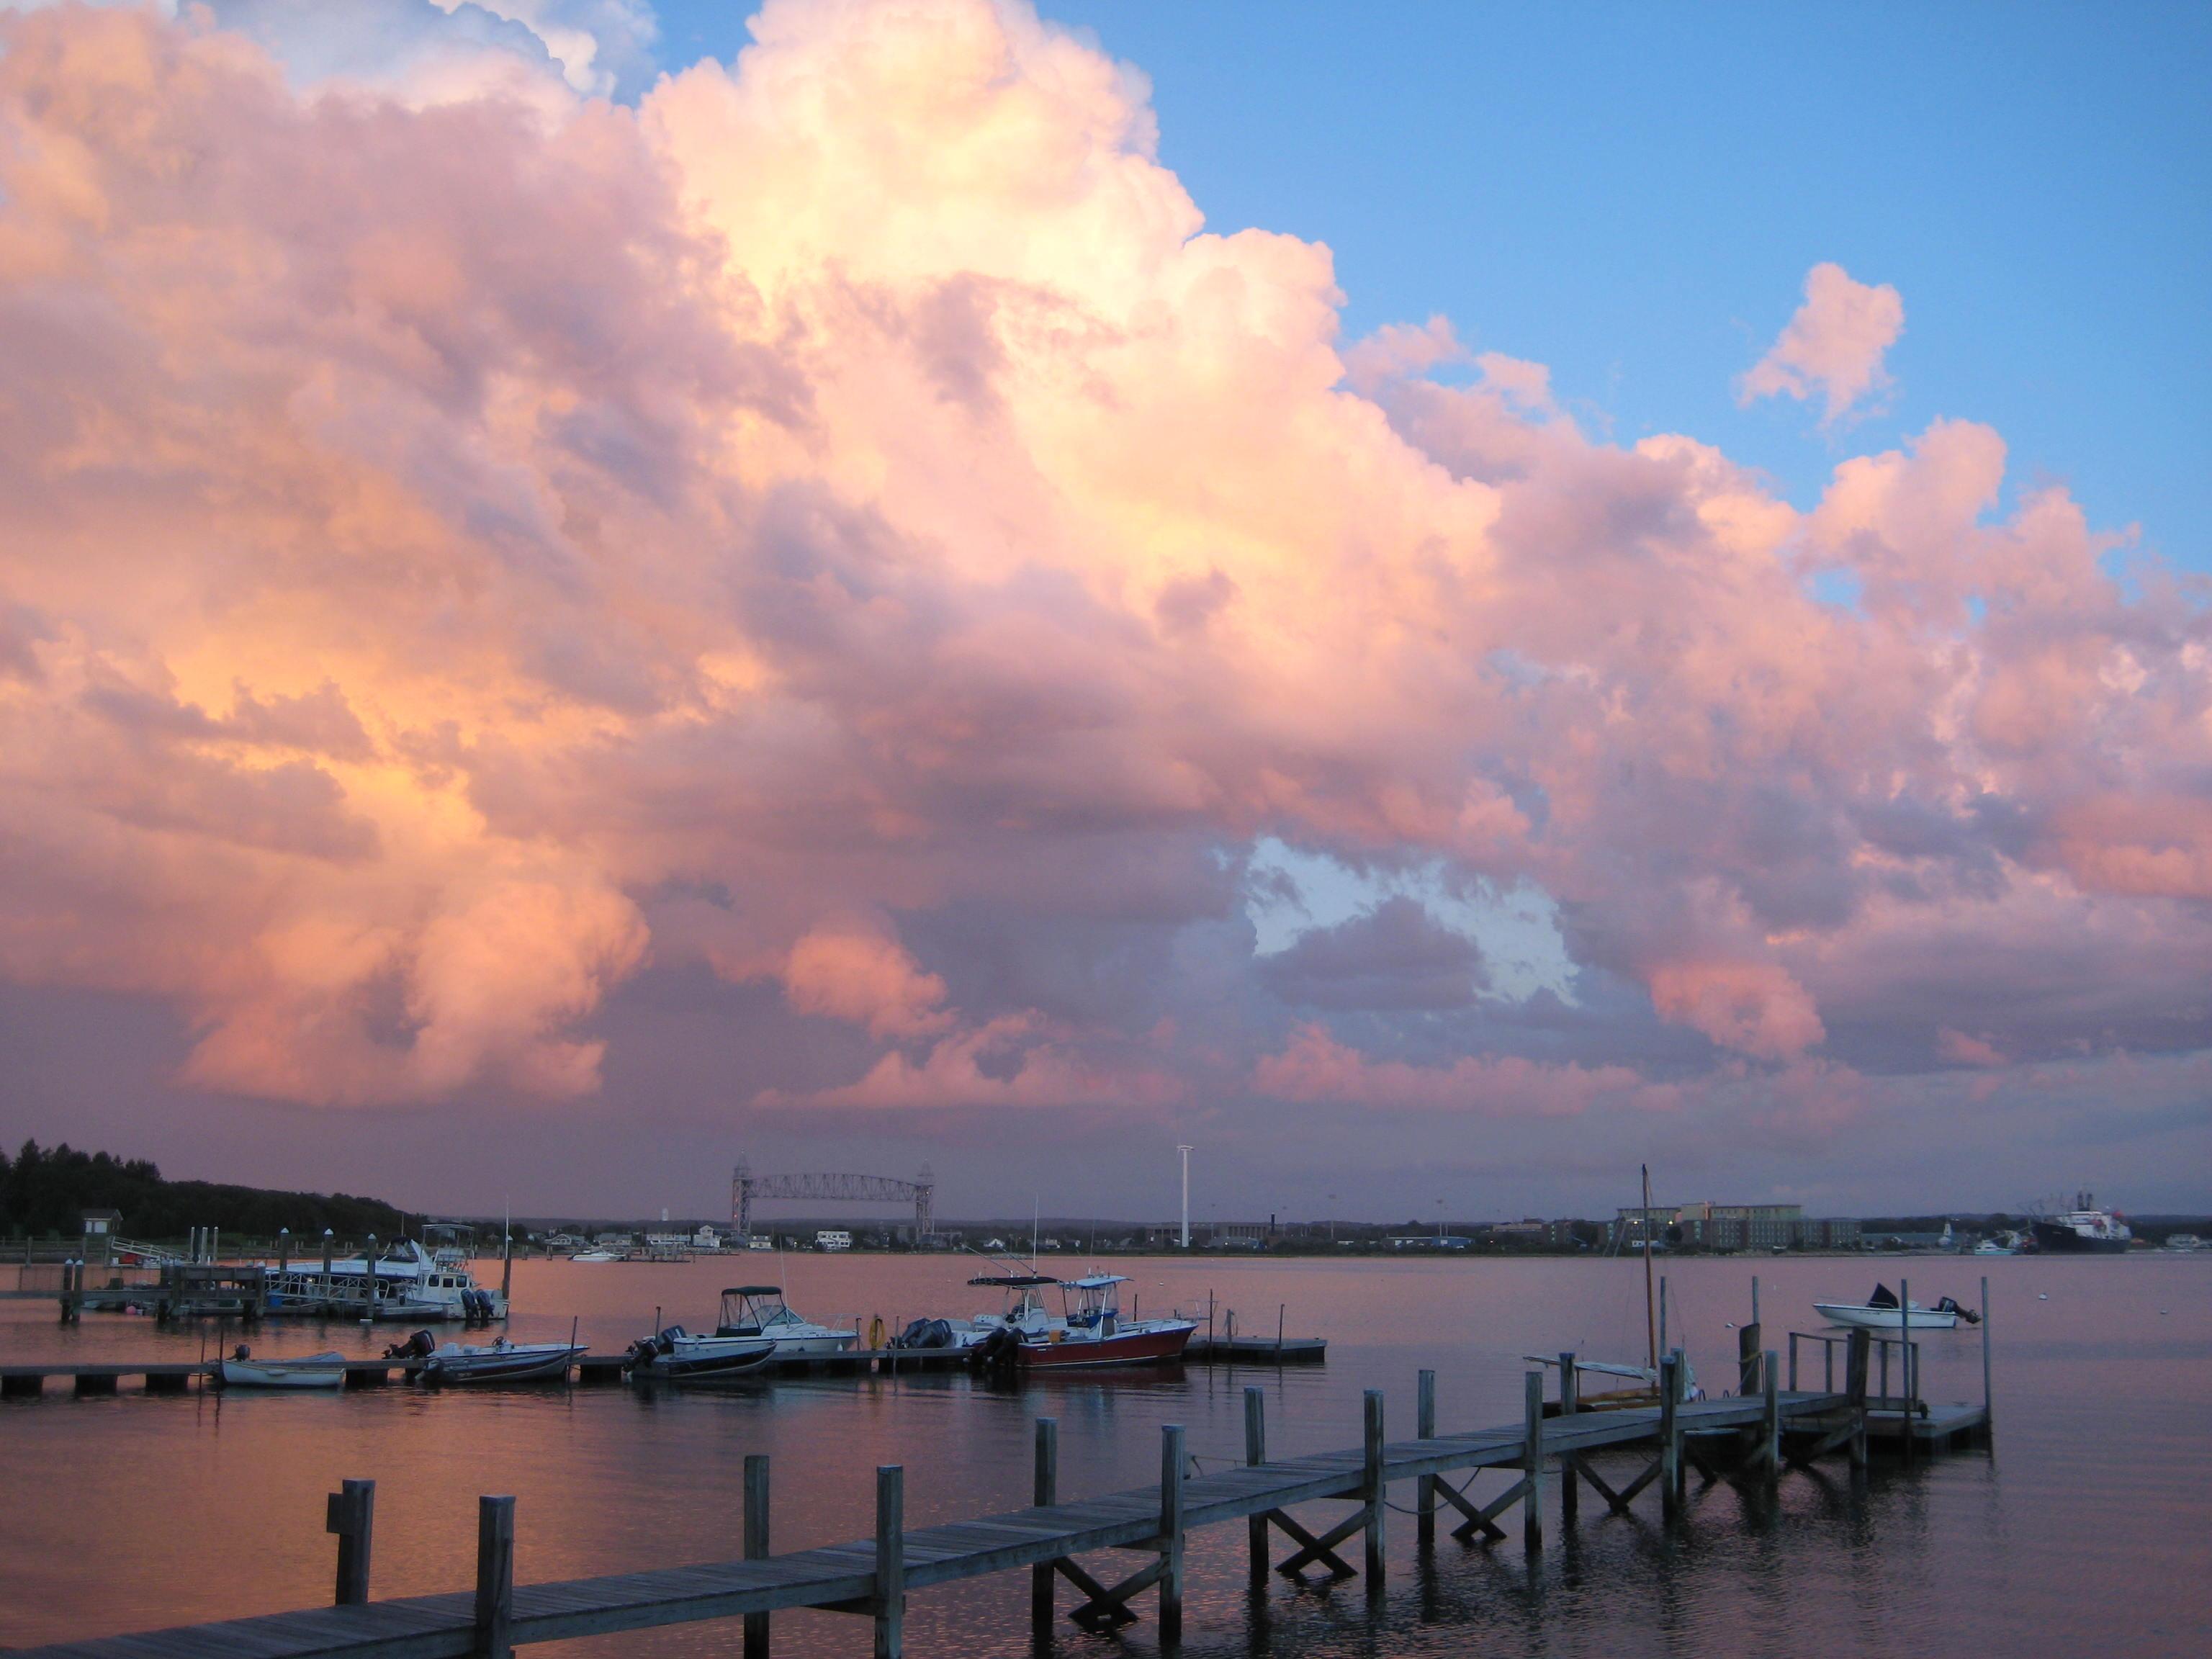 Cape Cod: Cotton Candy Clouds